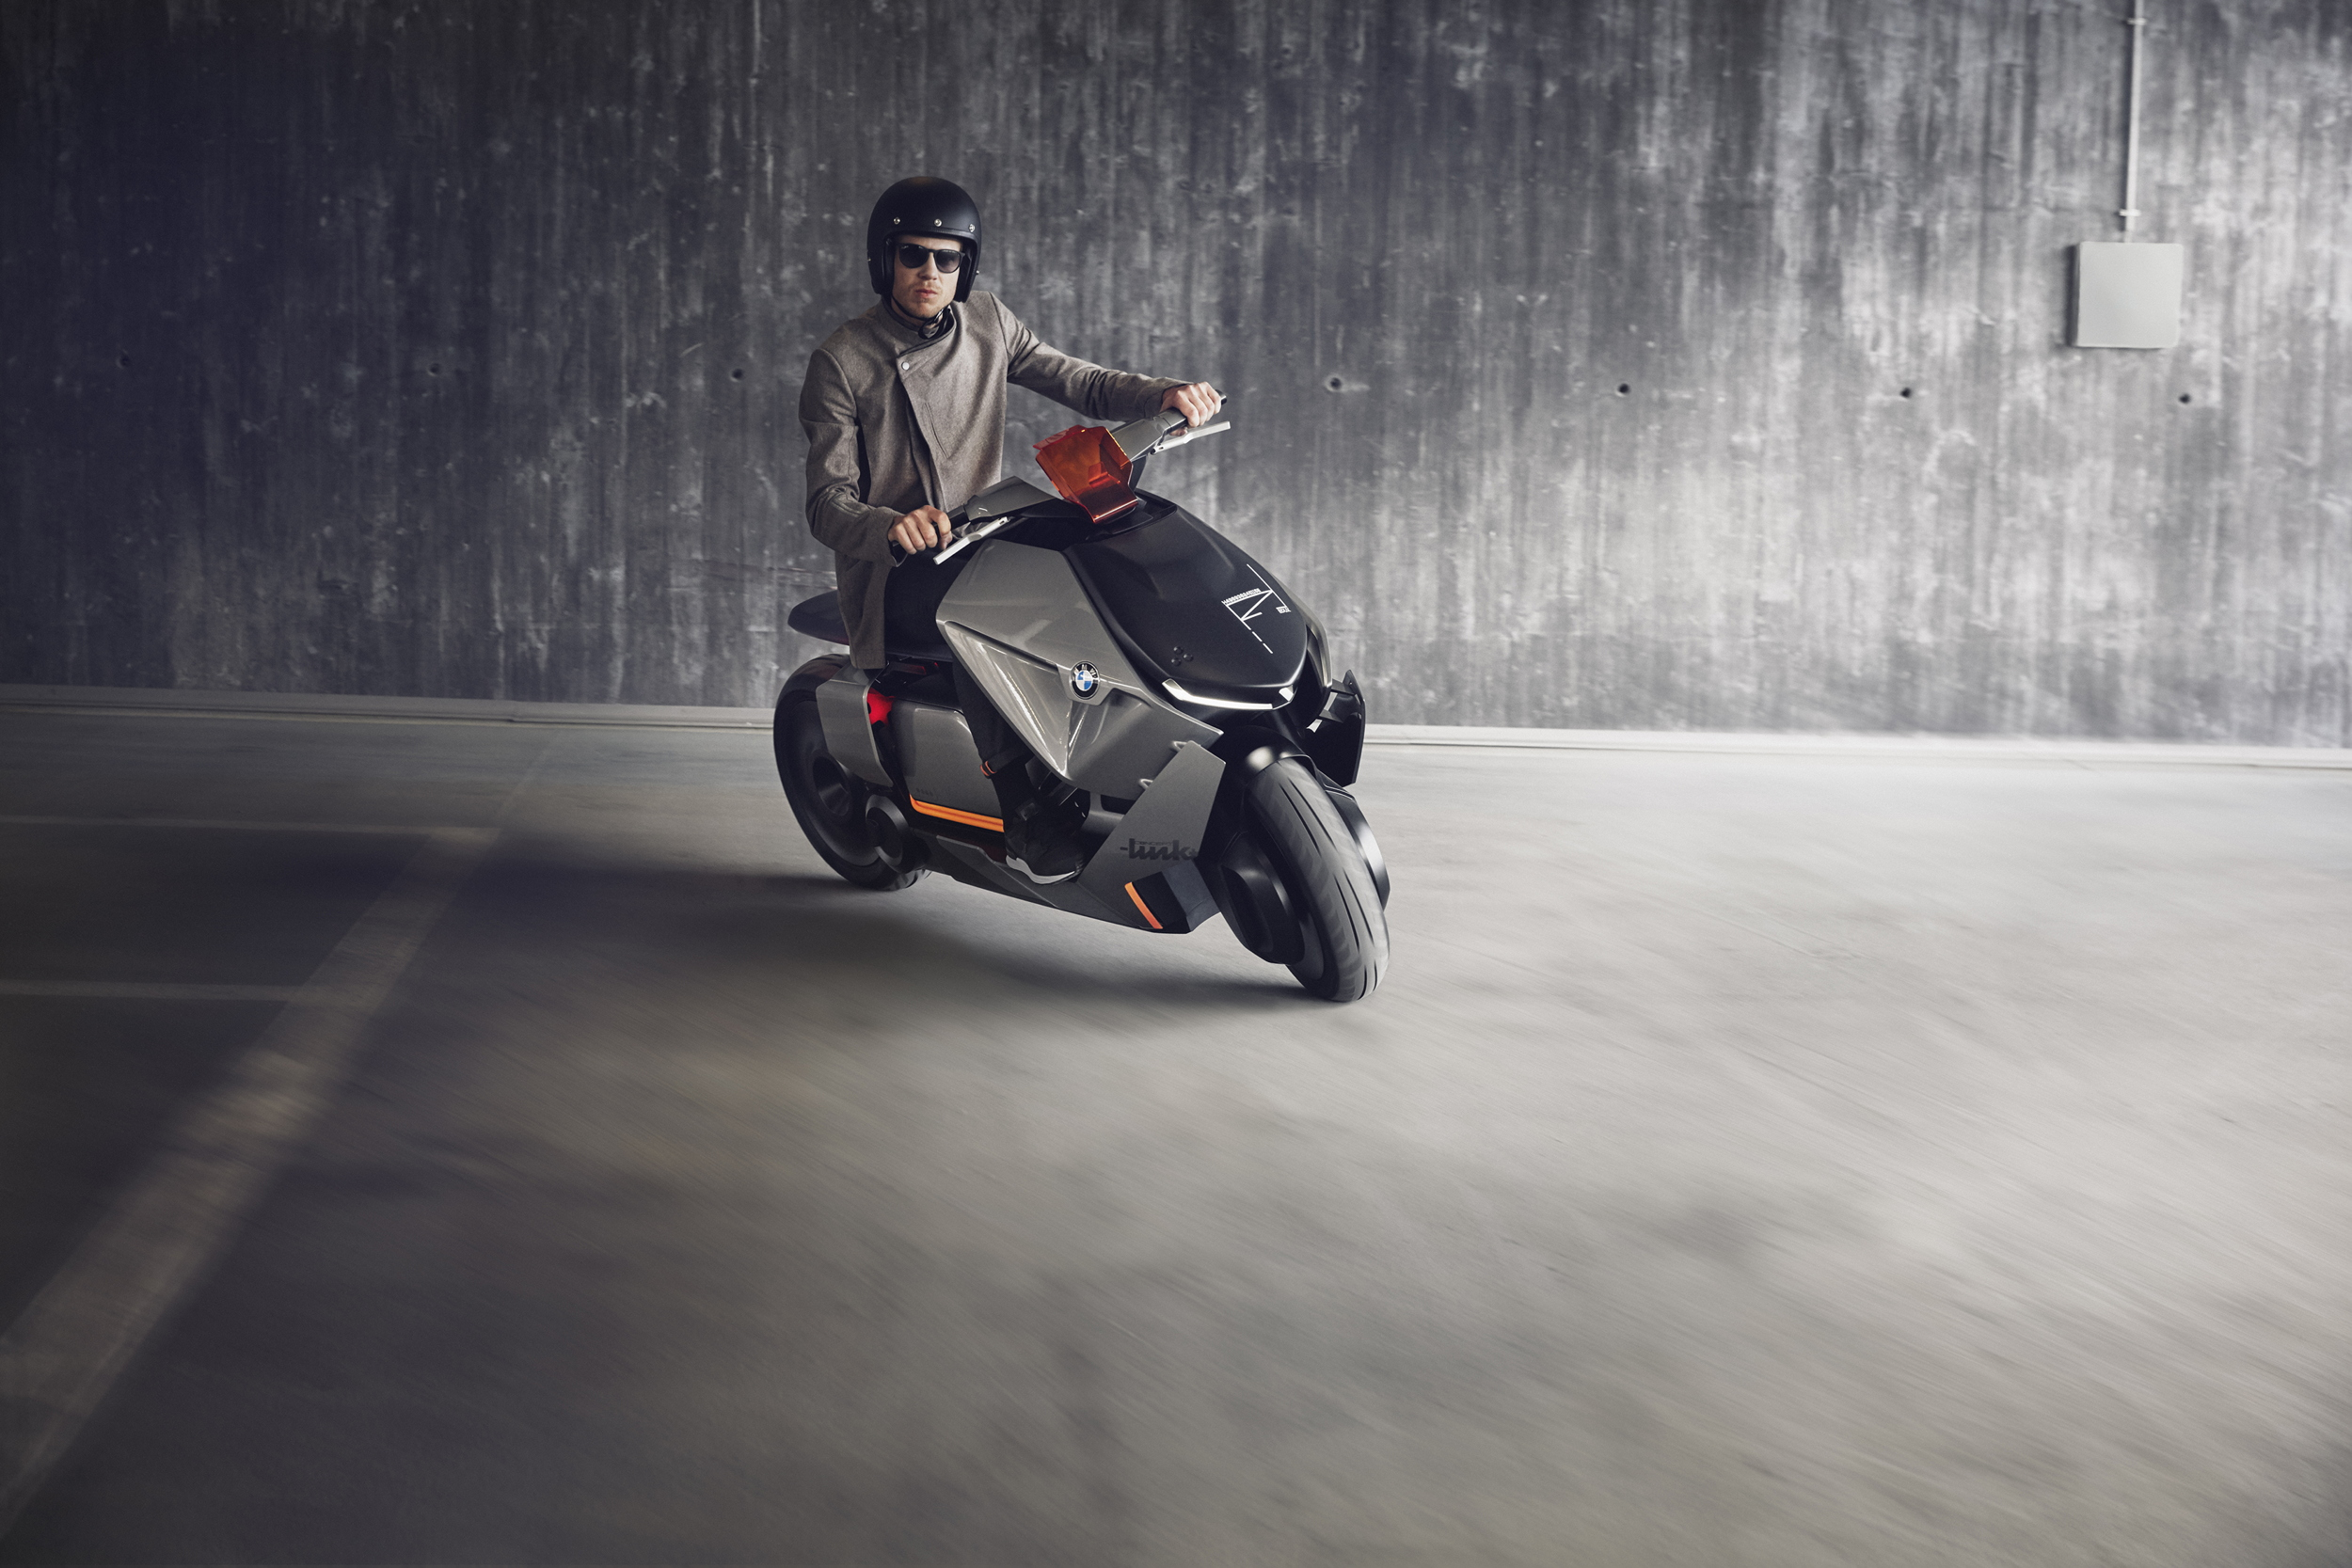 BMW Motorrad Concept Link riding